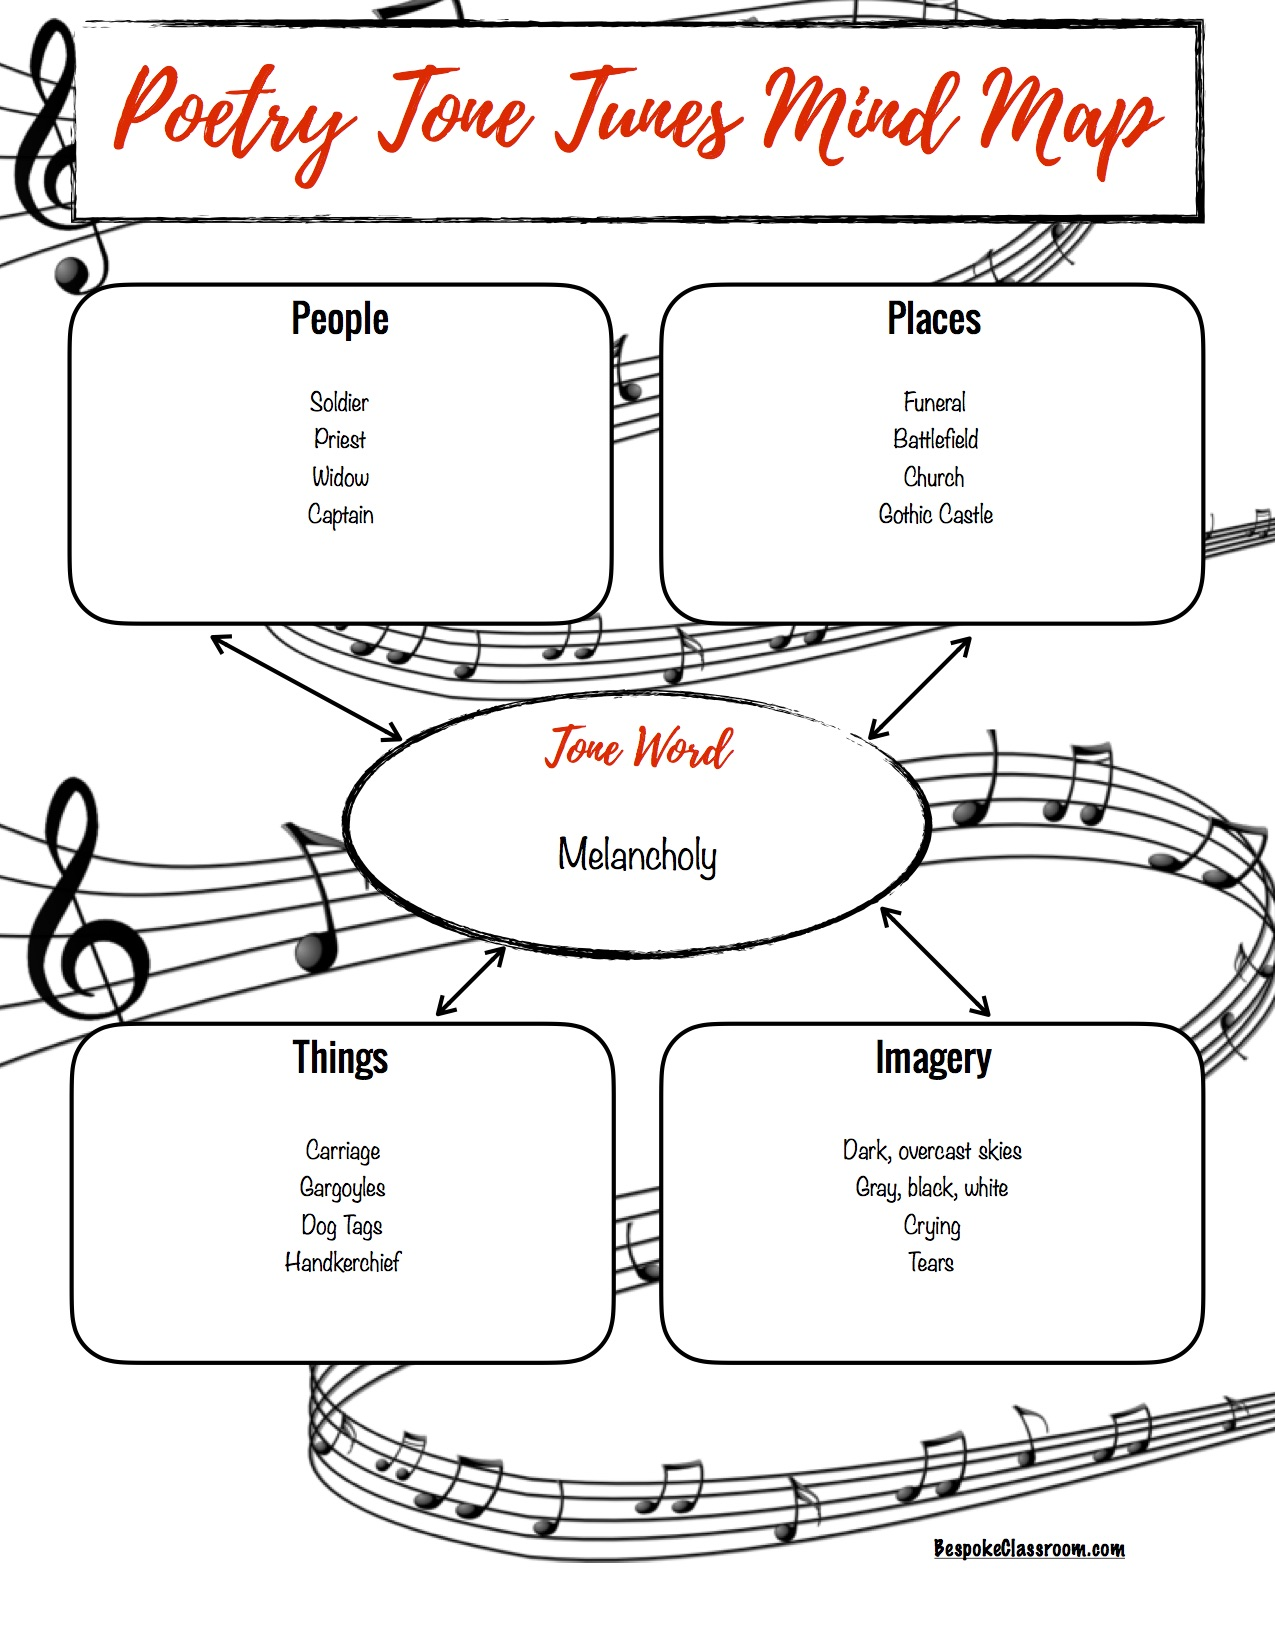 Poetry Tone Tunes Activity by Bespoke ELA pic2.jpg